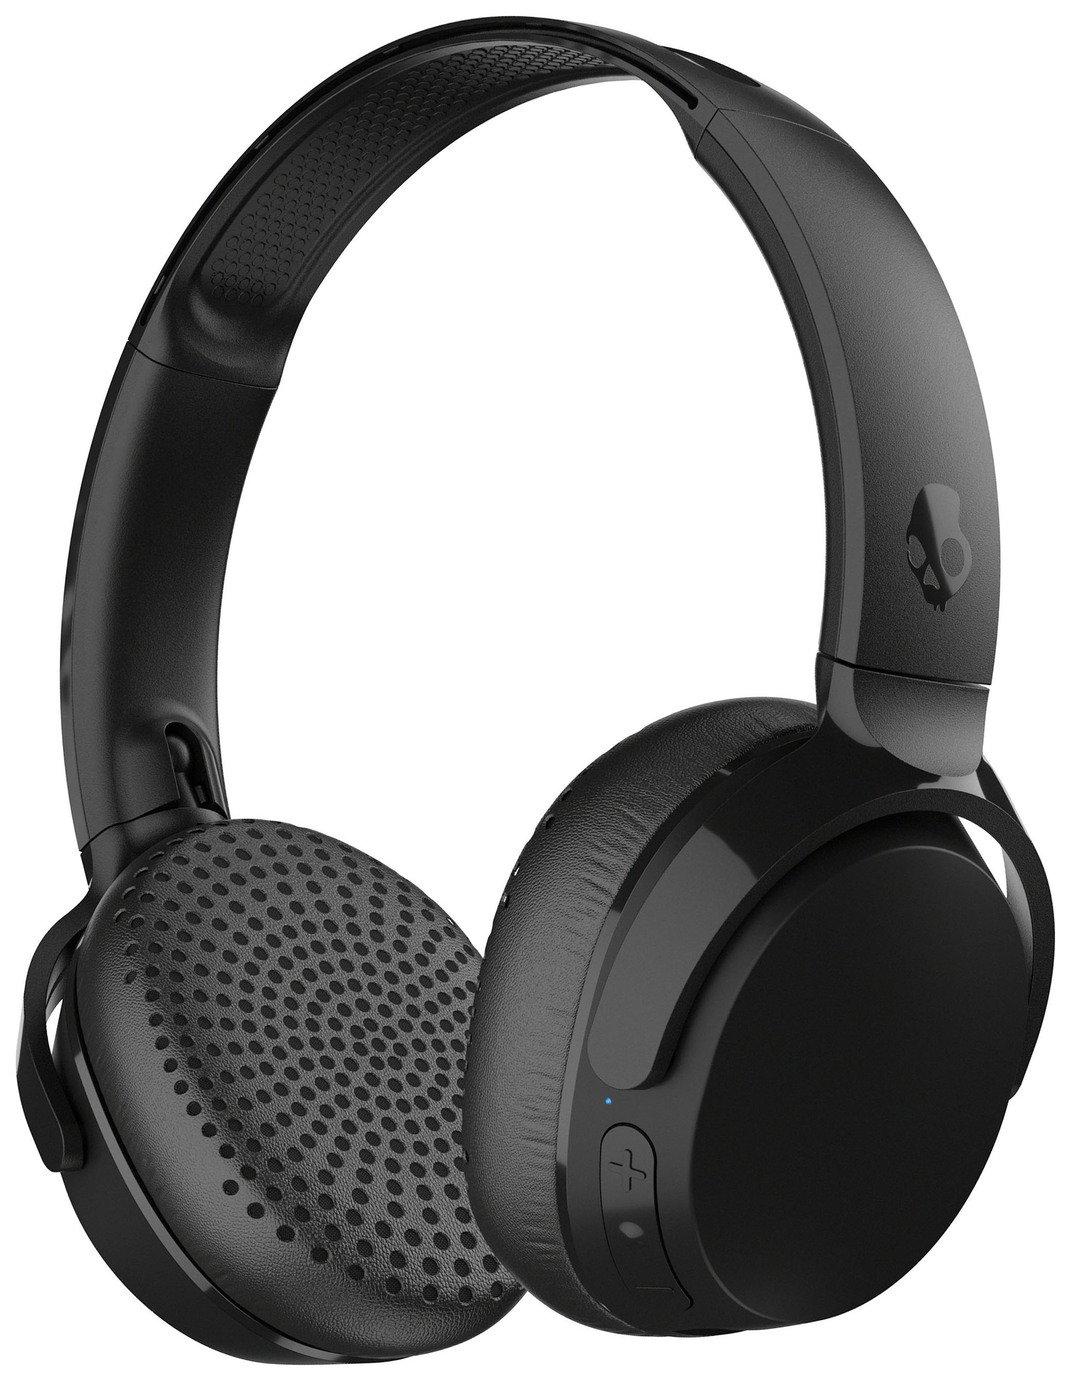 Skullcandy Riff On-Ear Wireless Headphones - Black